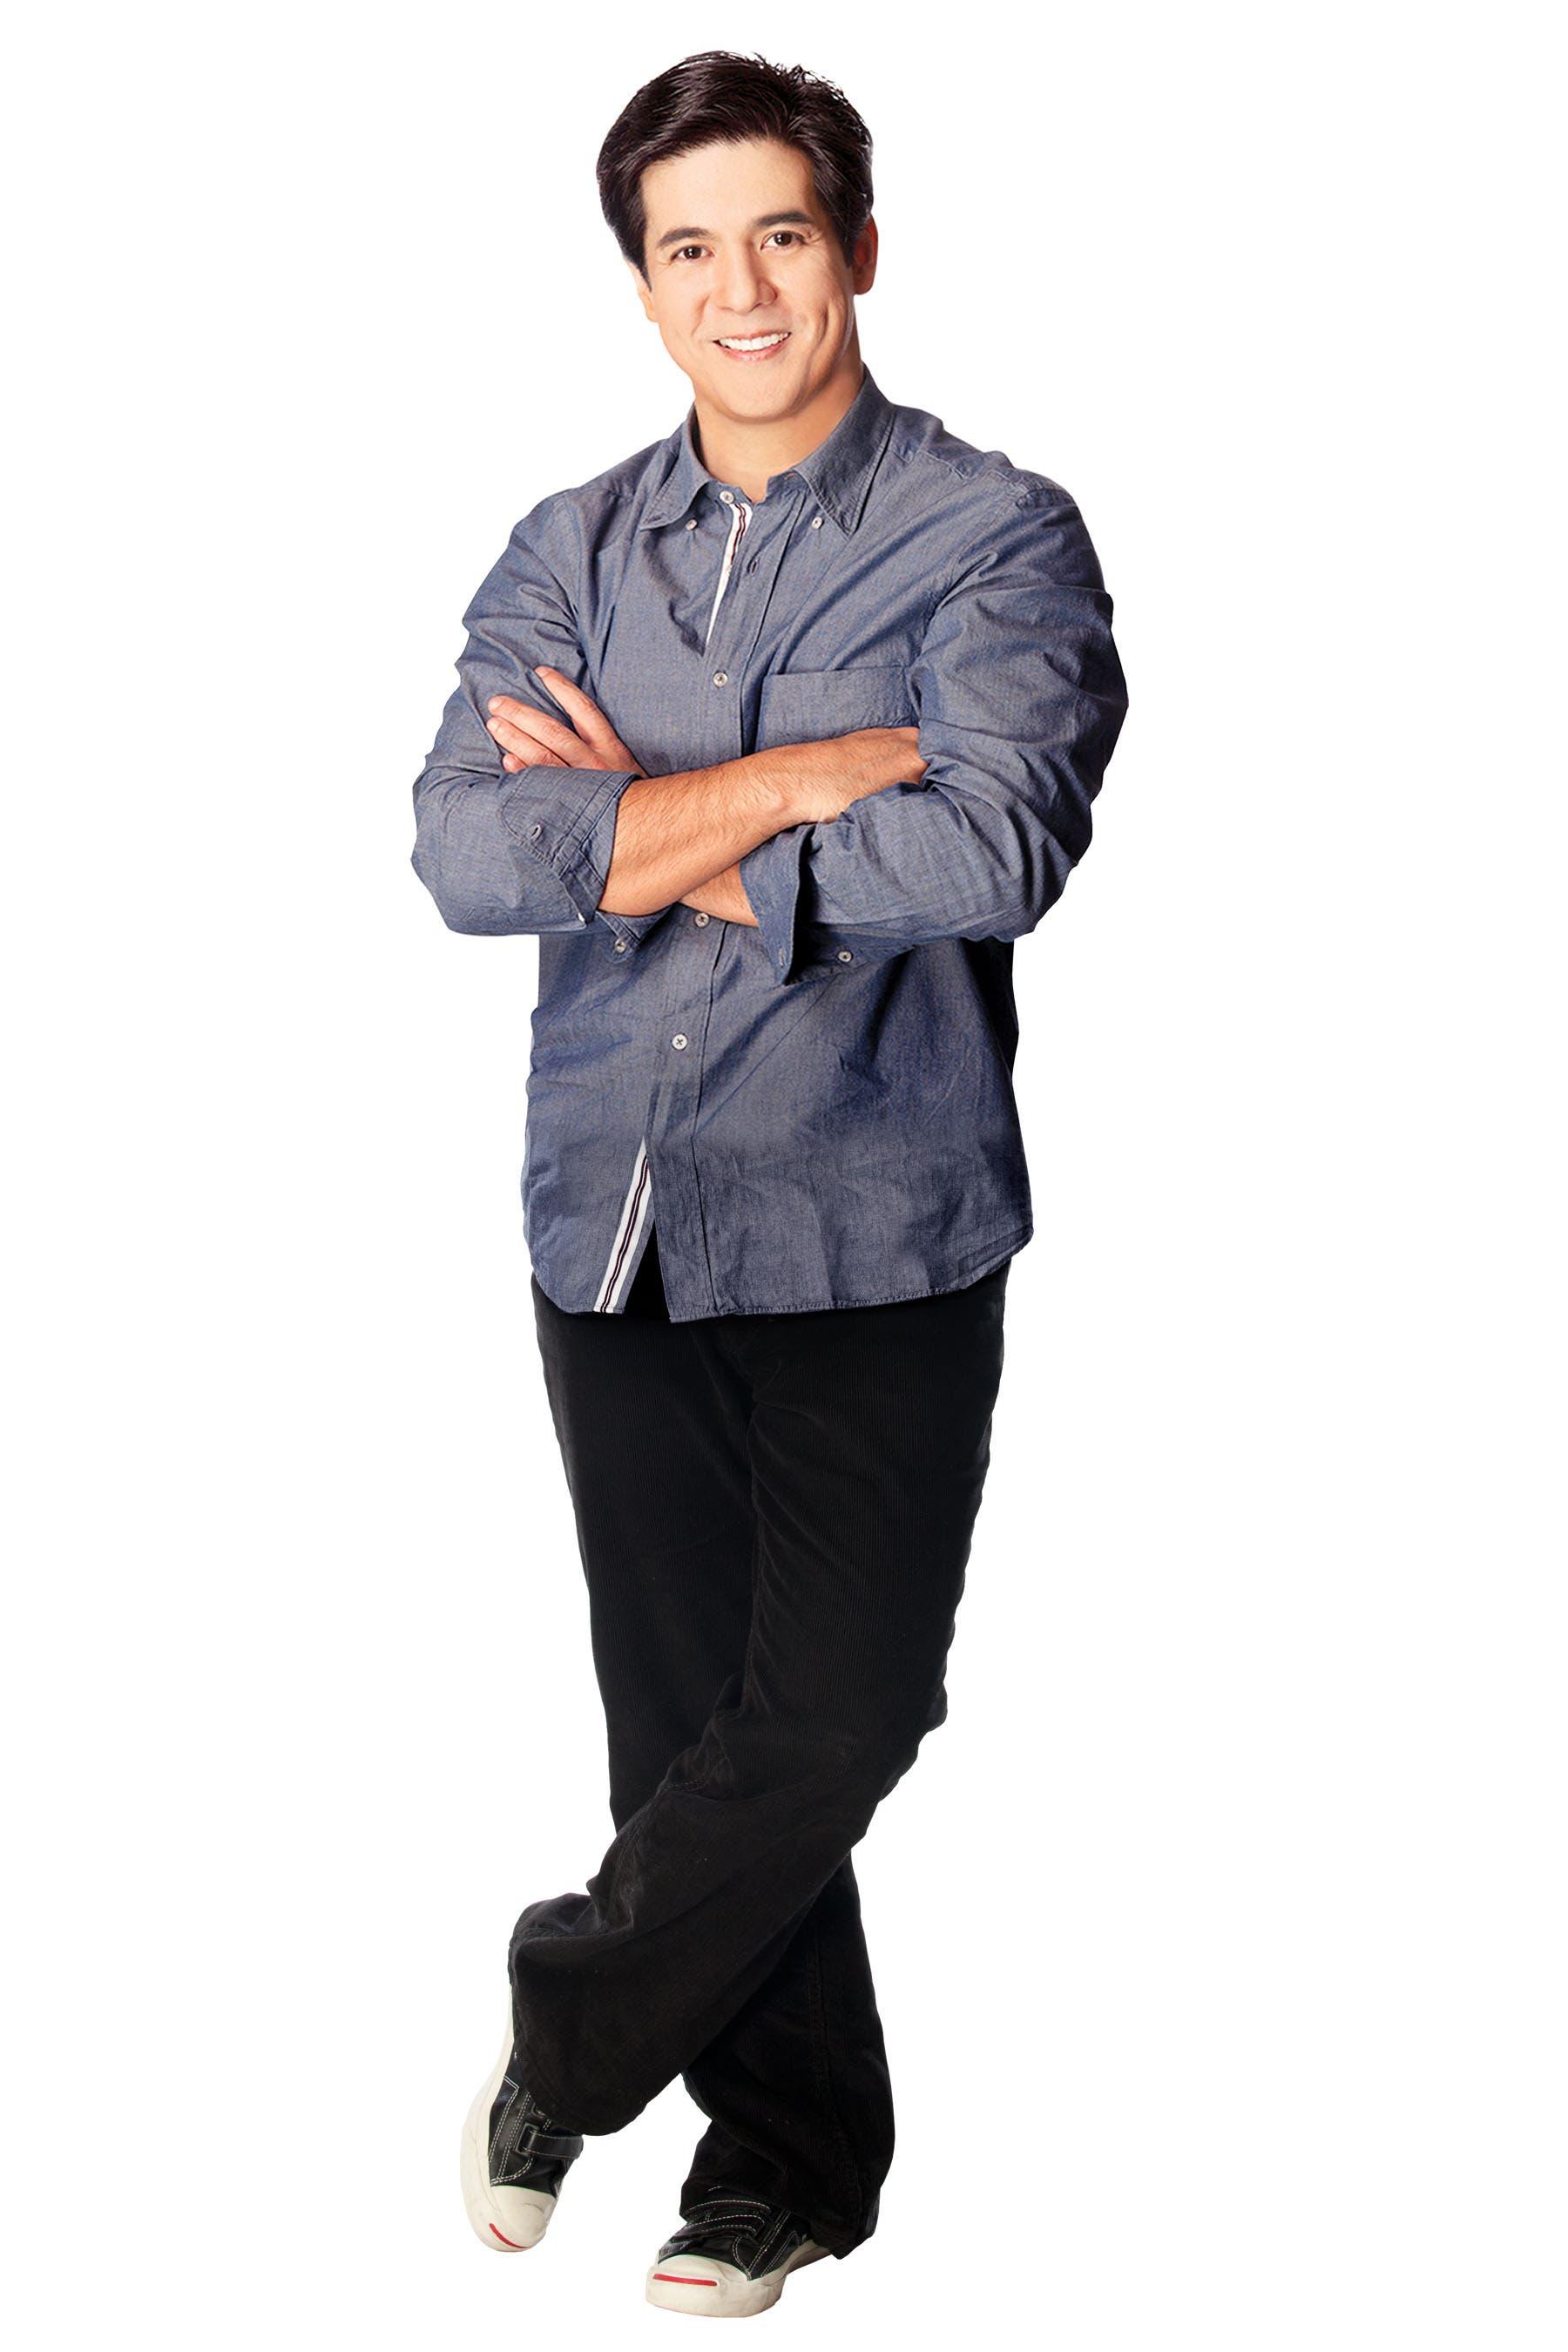 Pinoy Explorer - Aga Muhlach